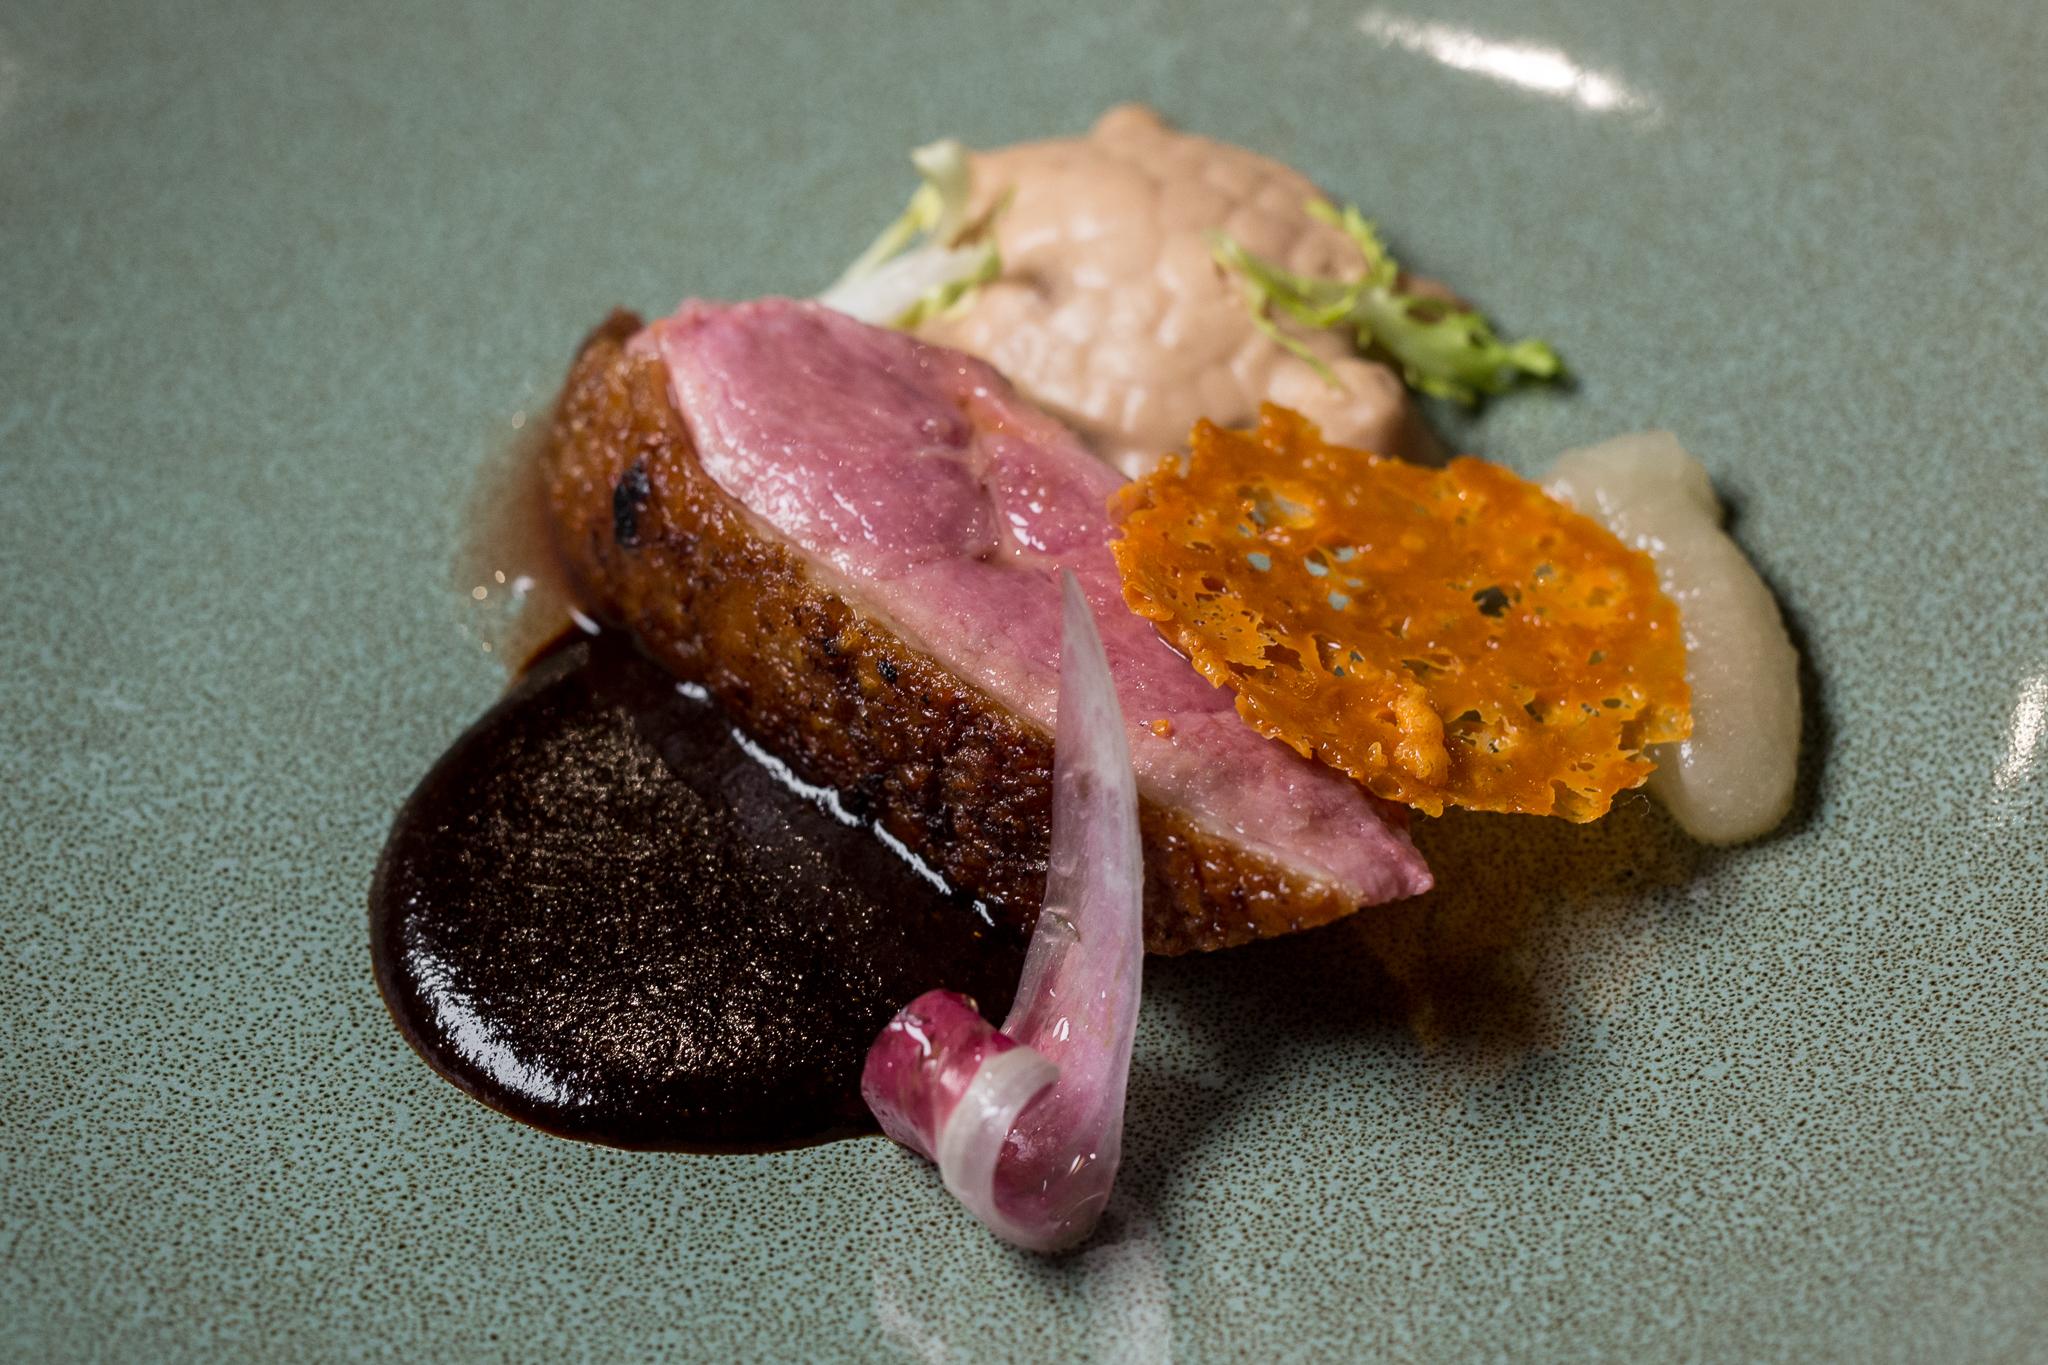 Cider-Glazed Duck, Mole Rojo, Julian Apple, Cheddar Tuile, Foie Gras